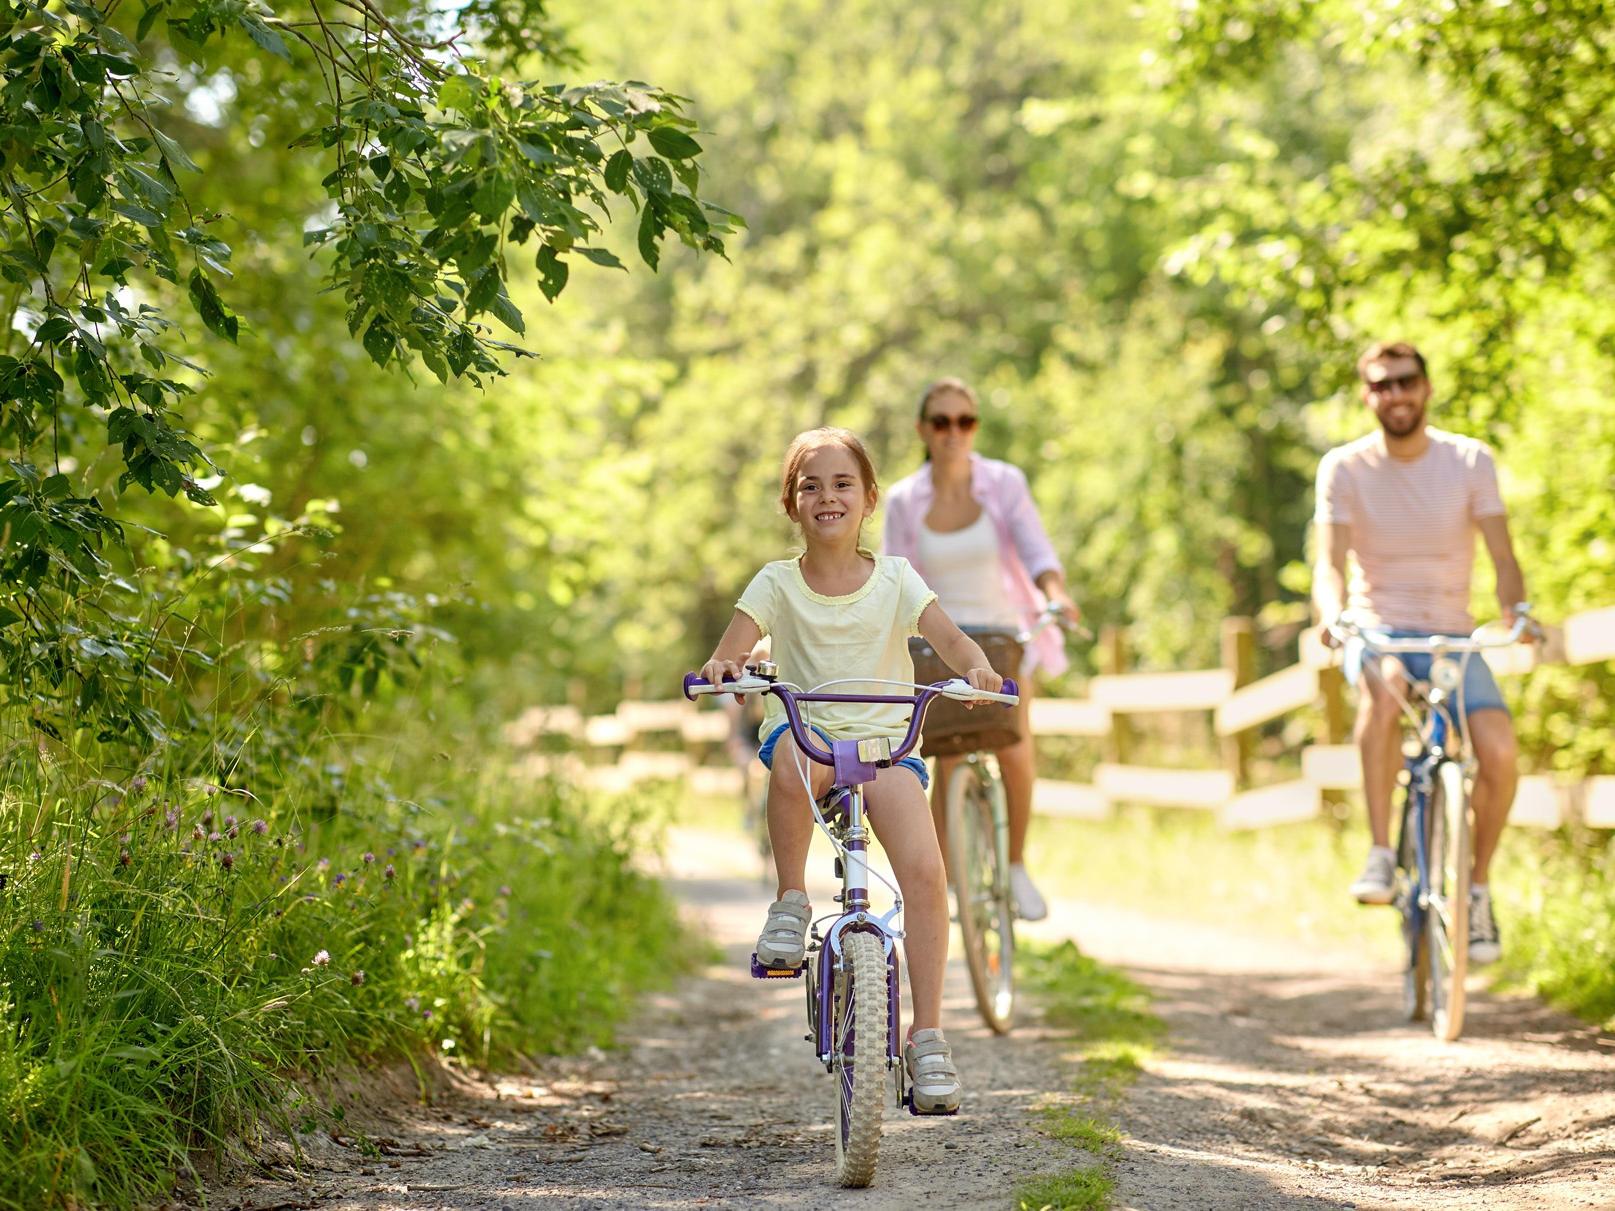 biking near Precise Resort Marina Wolfsbruch